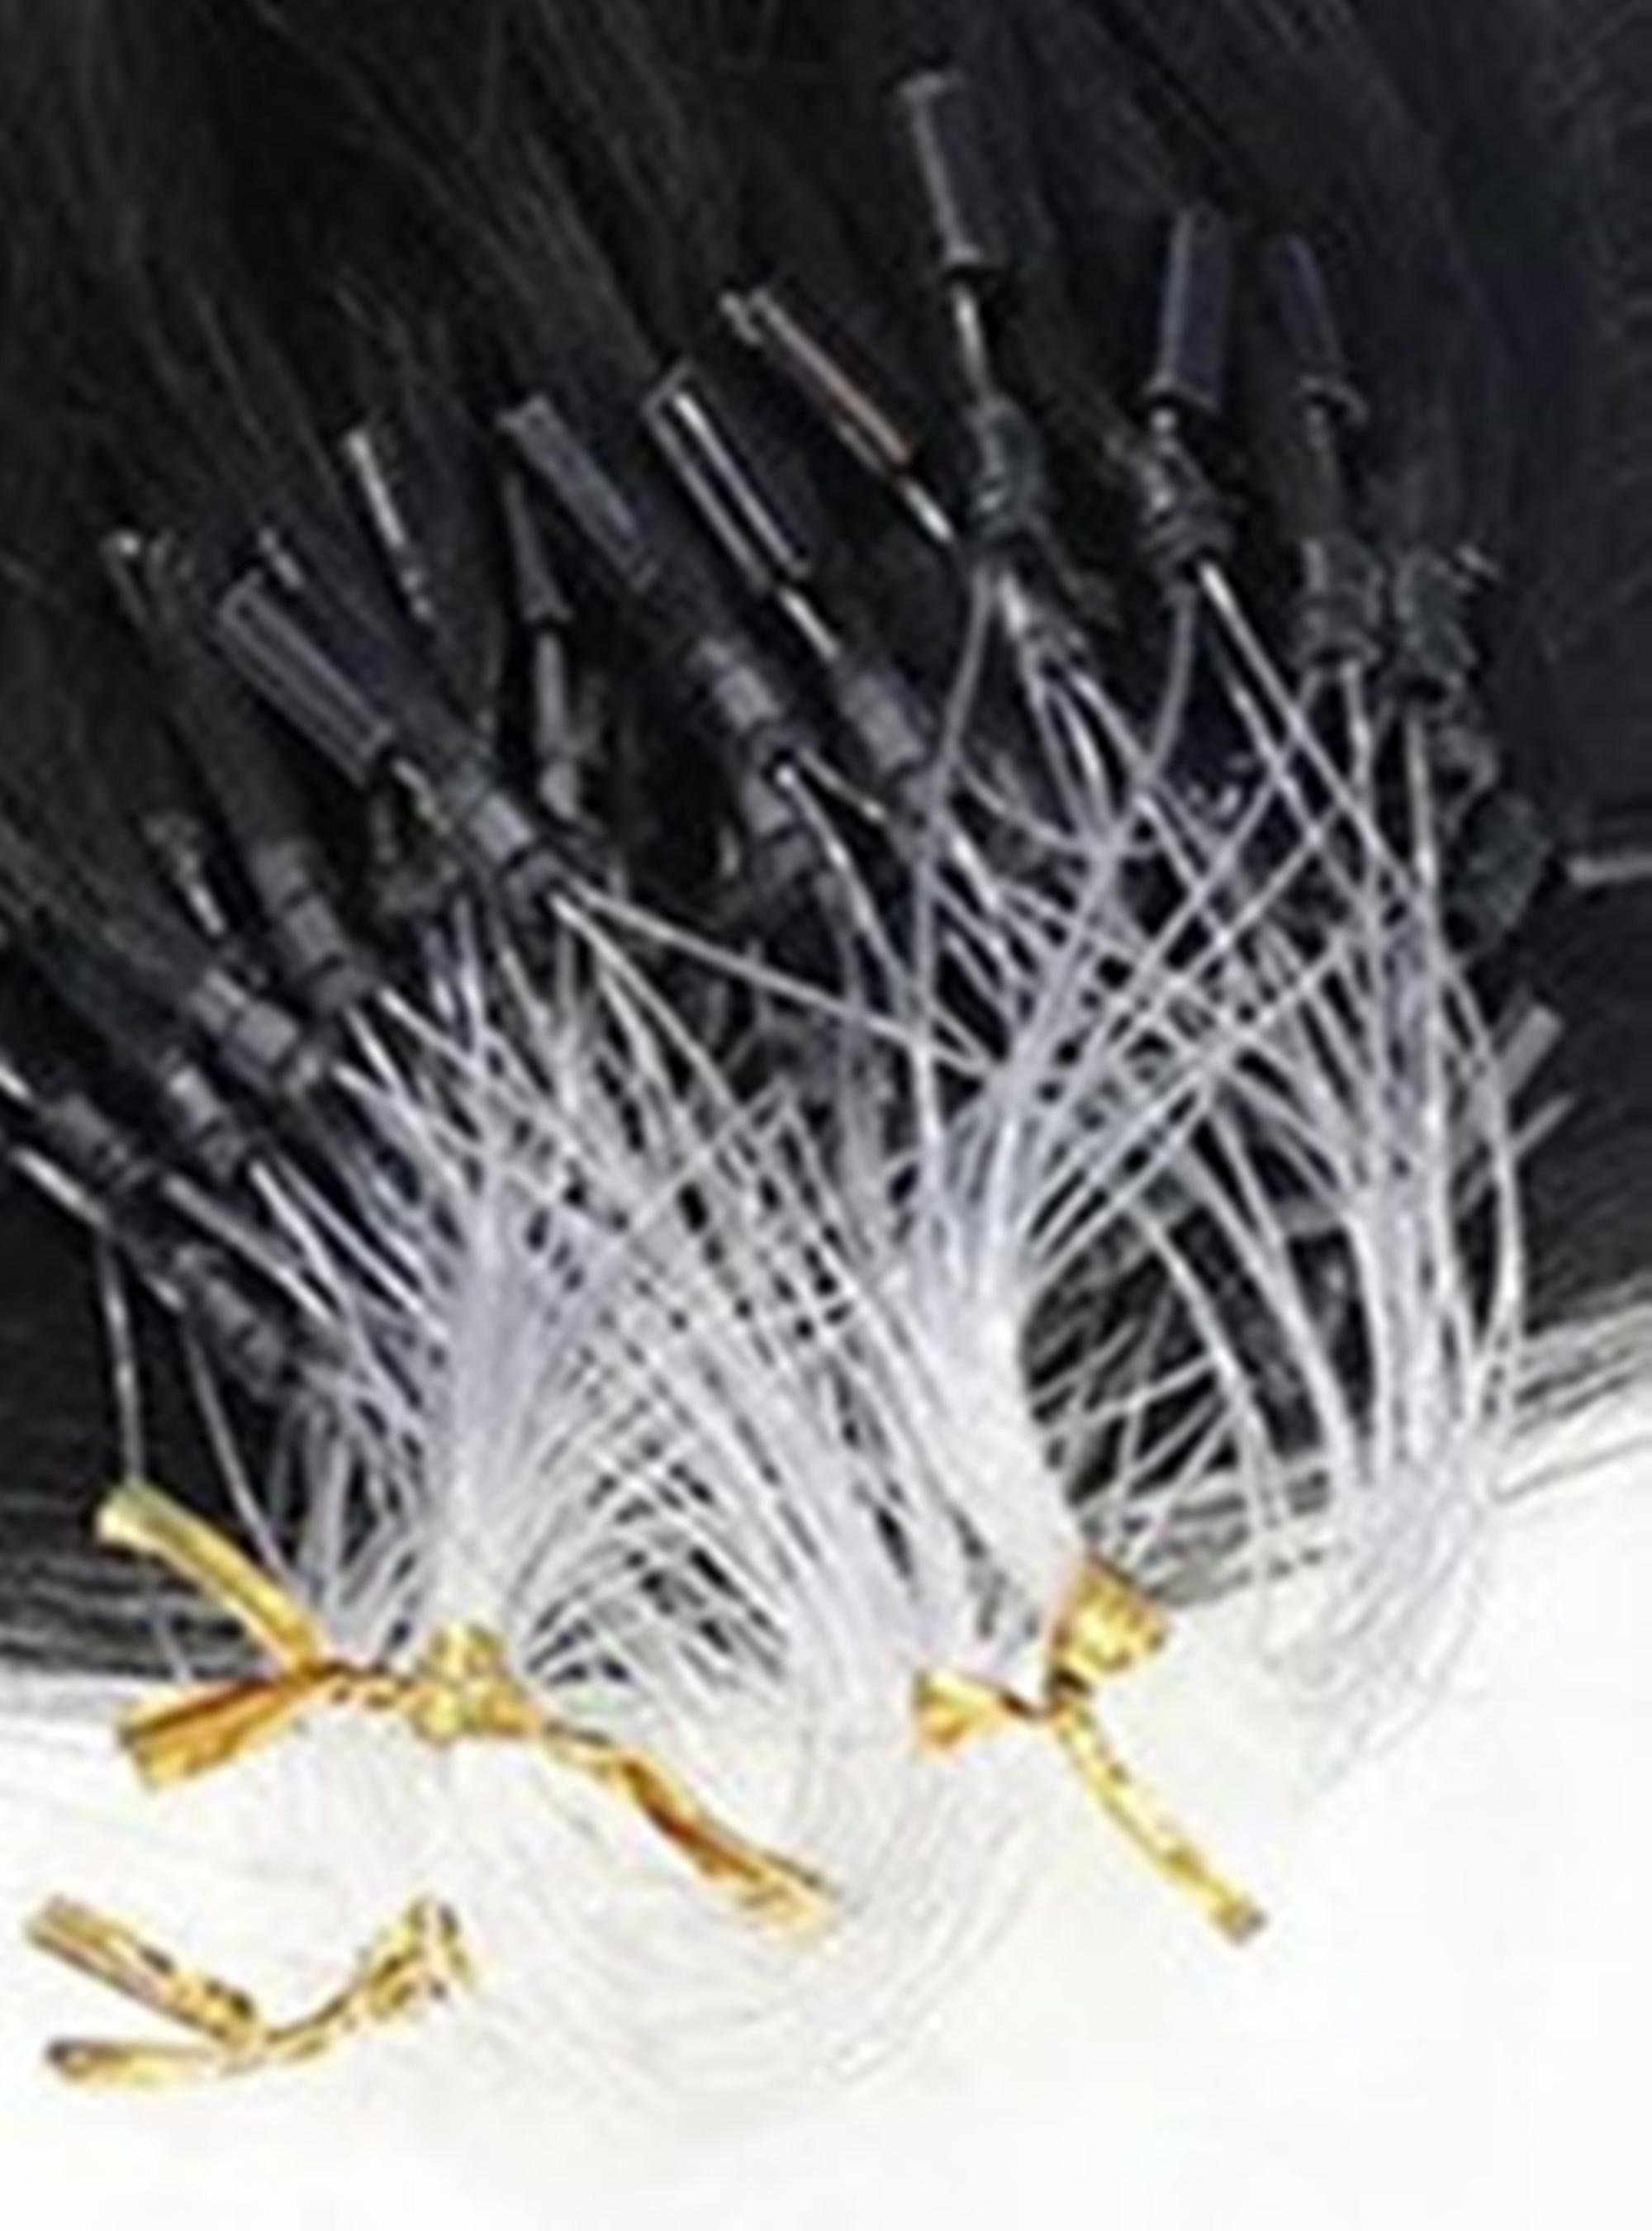 LEDON Micro Ring Loop Hair extension, Bodywave BW, Color 1B Black, 100% Human Hair Extensions